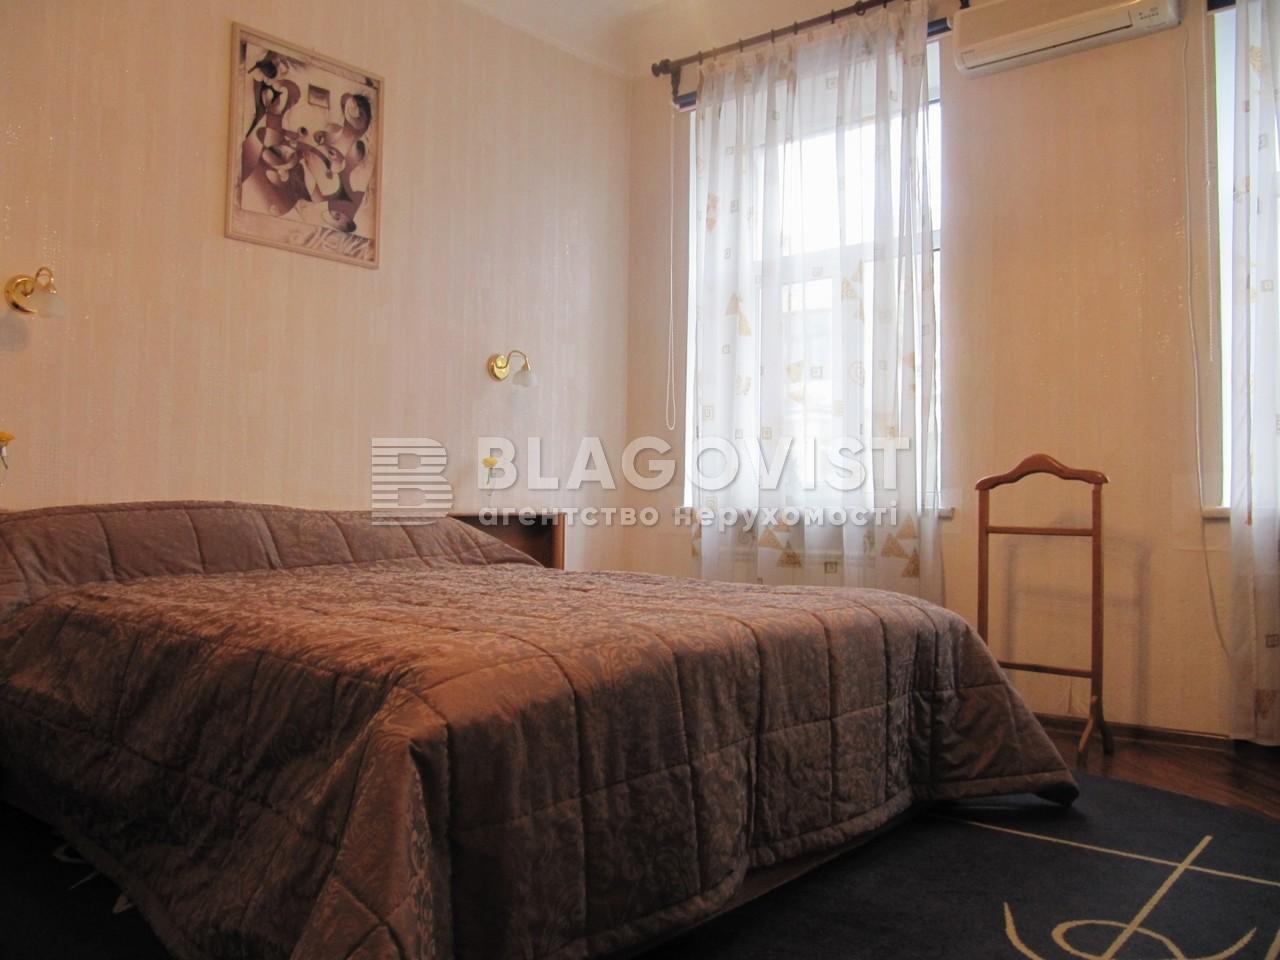 Квартира C-73053, Лютеранская, 27/29, Киев - Фото 7